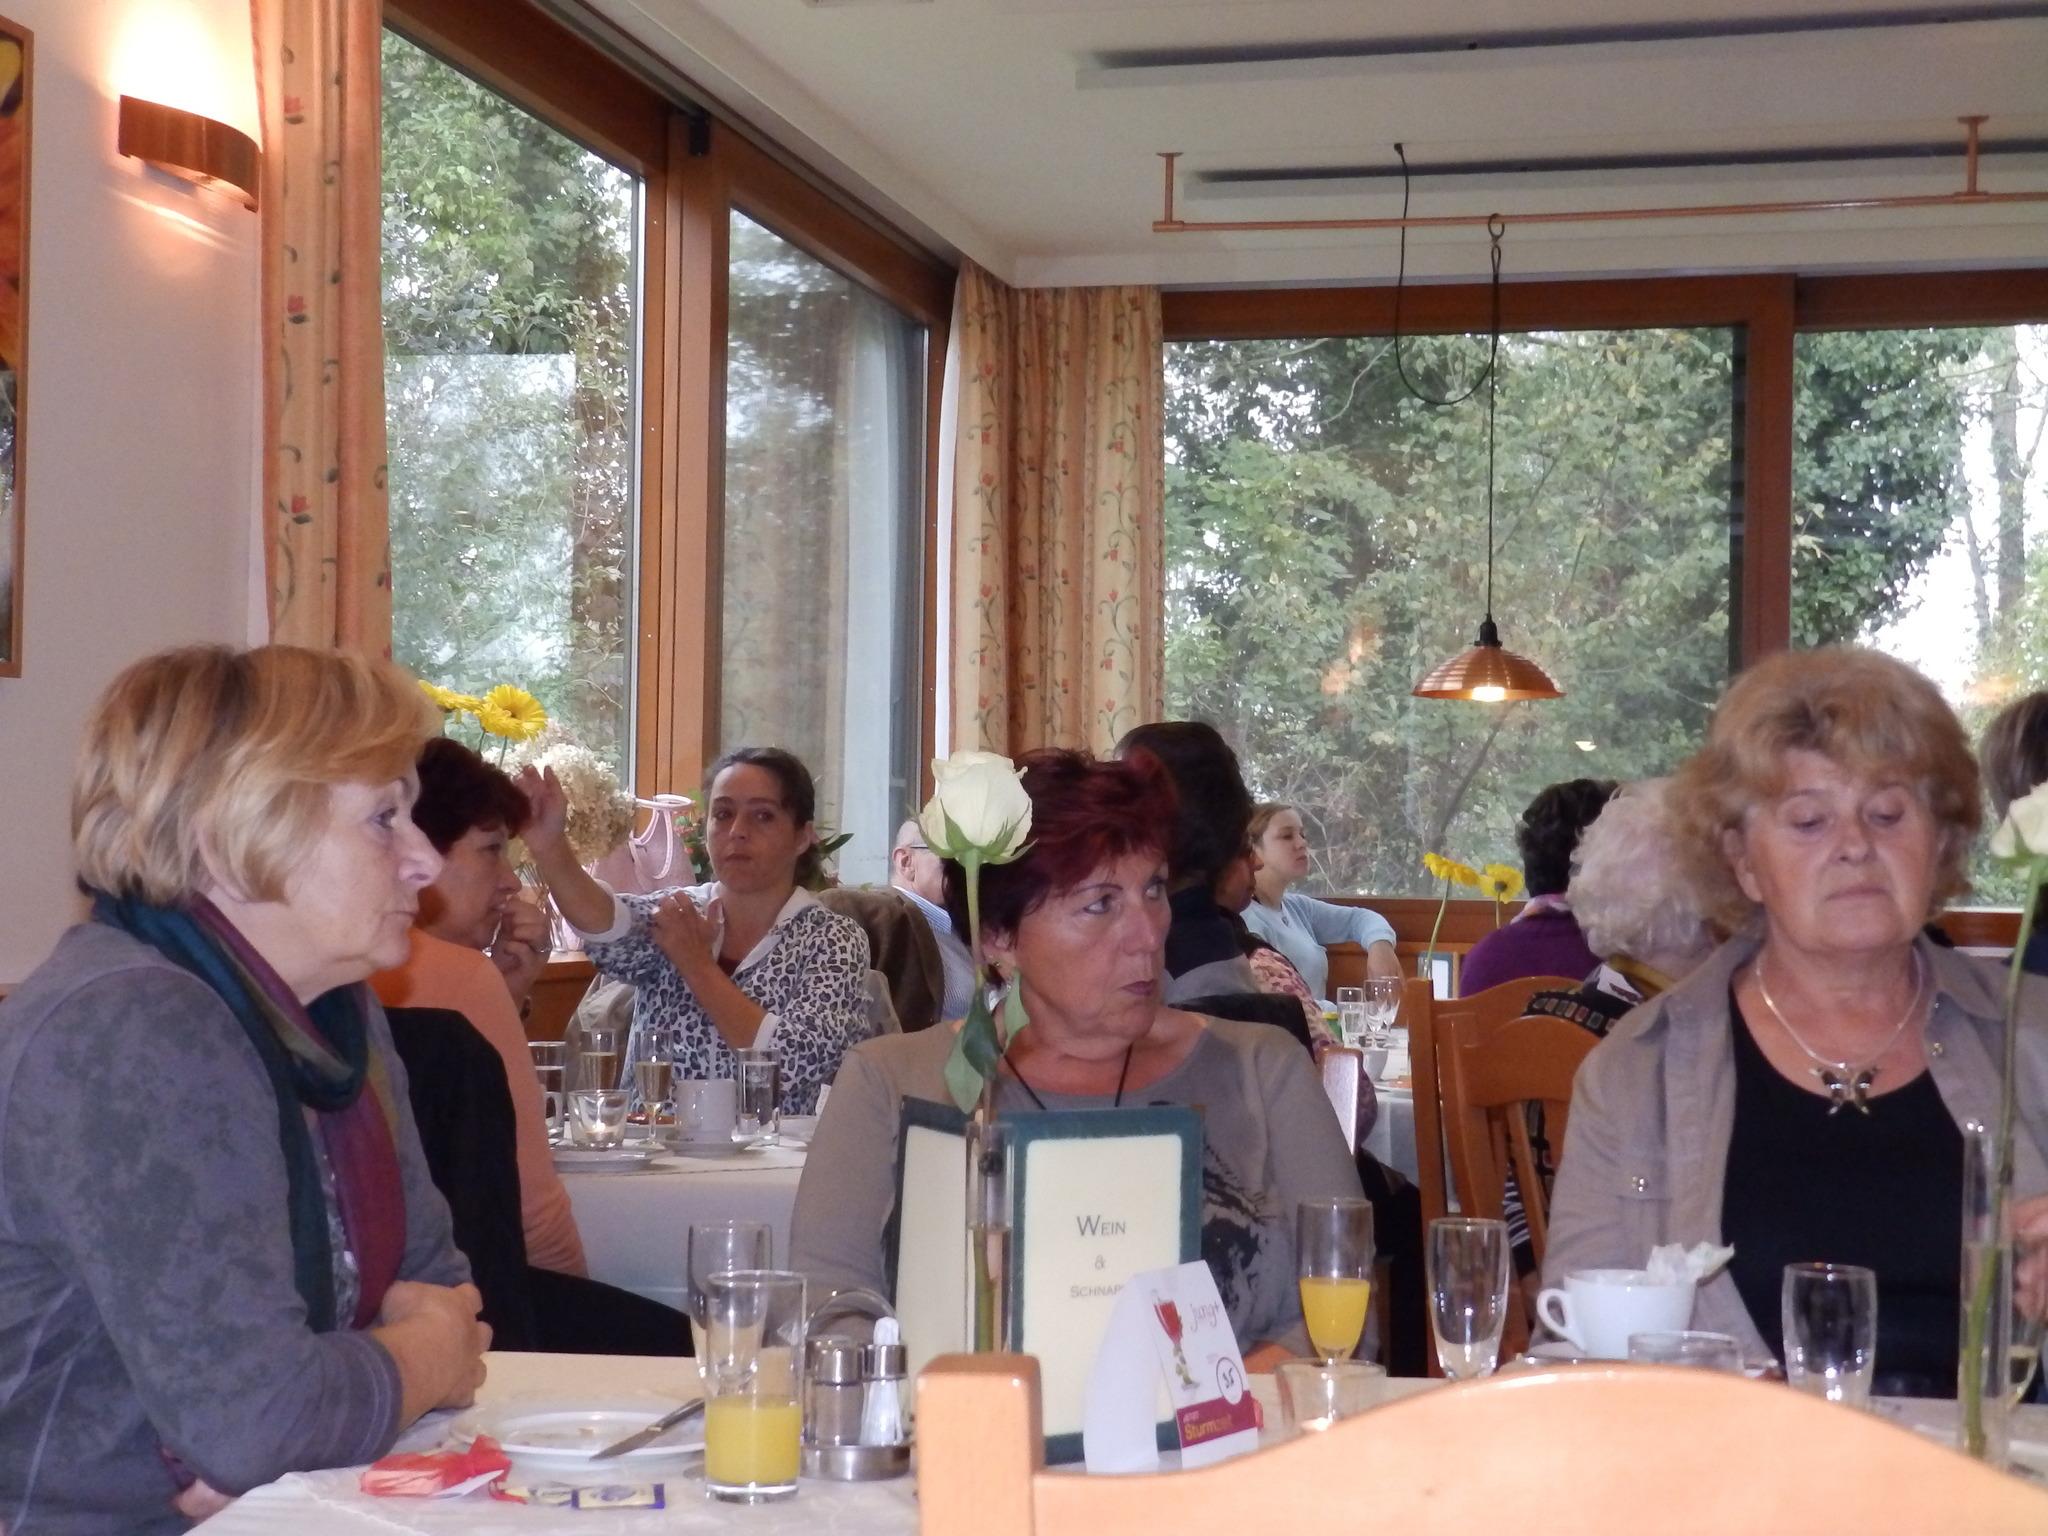 Single flirt in korneuburg - volunteeralert.com / 2020 / Lofer frau